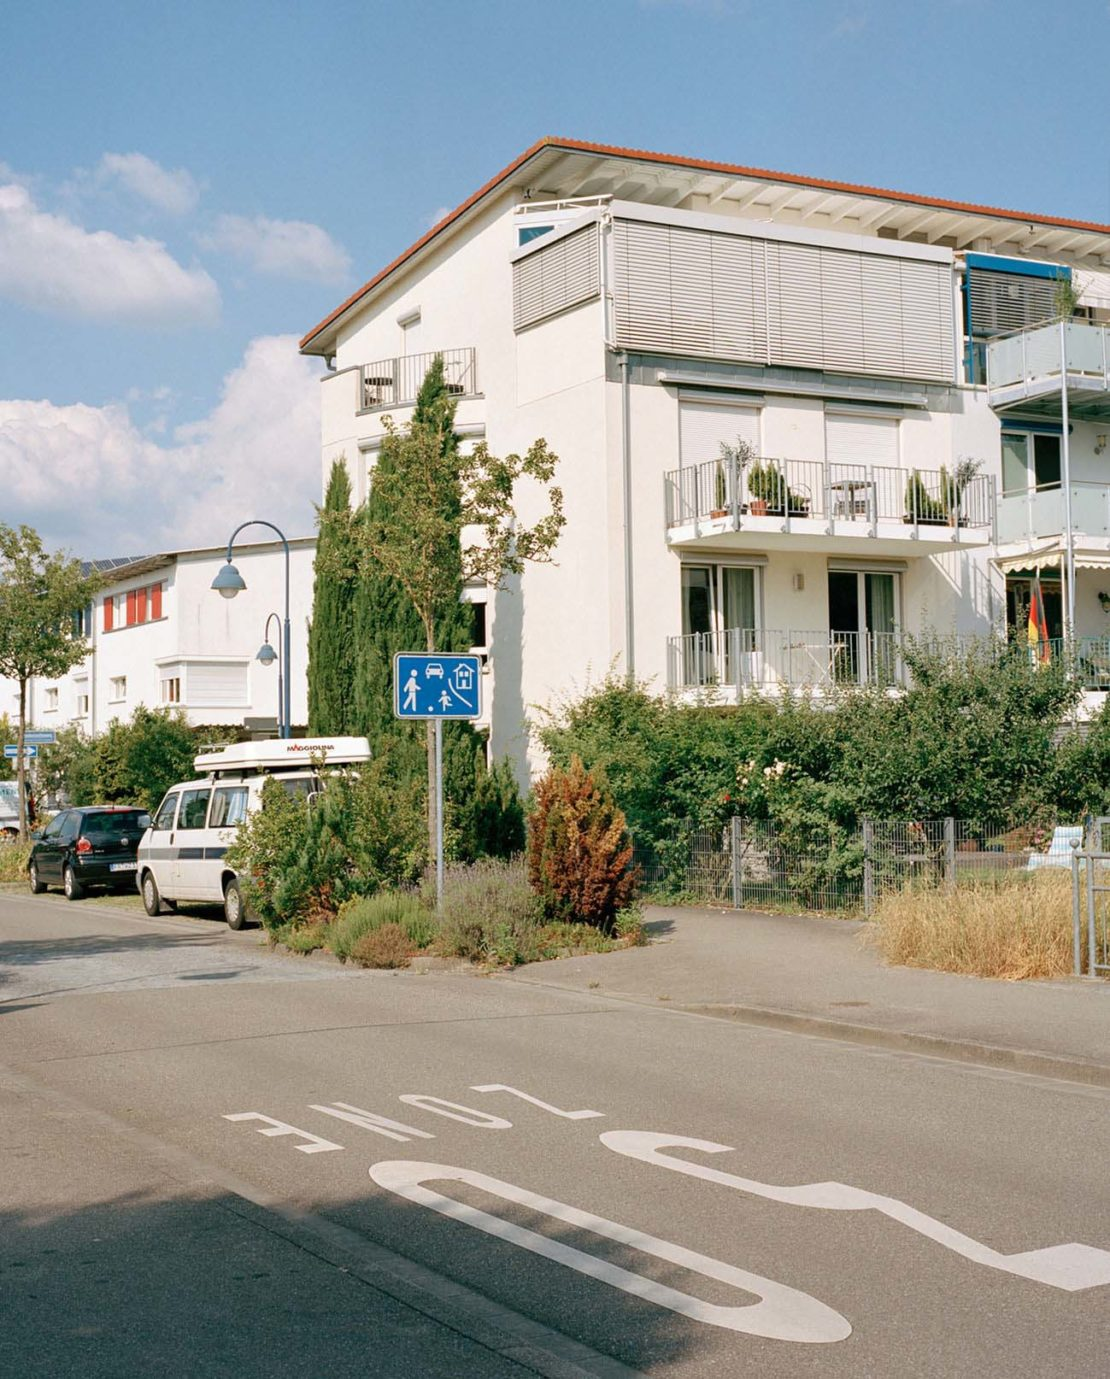 Freiburg street scene